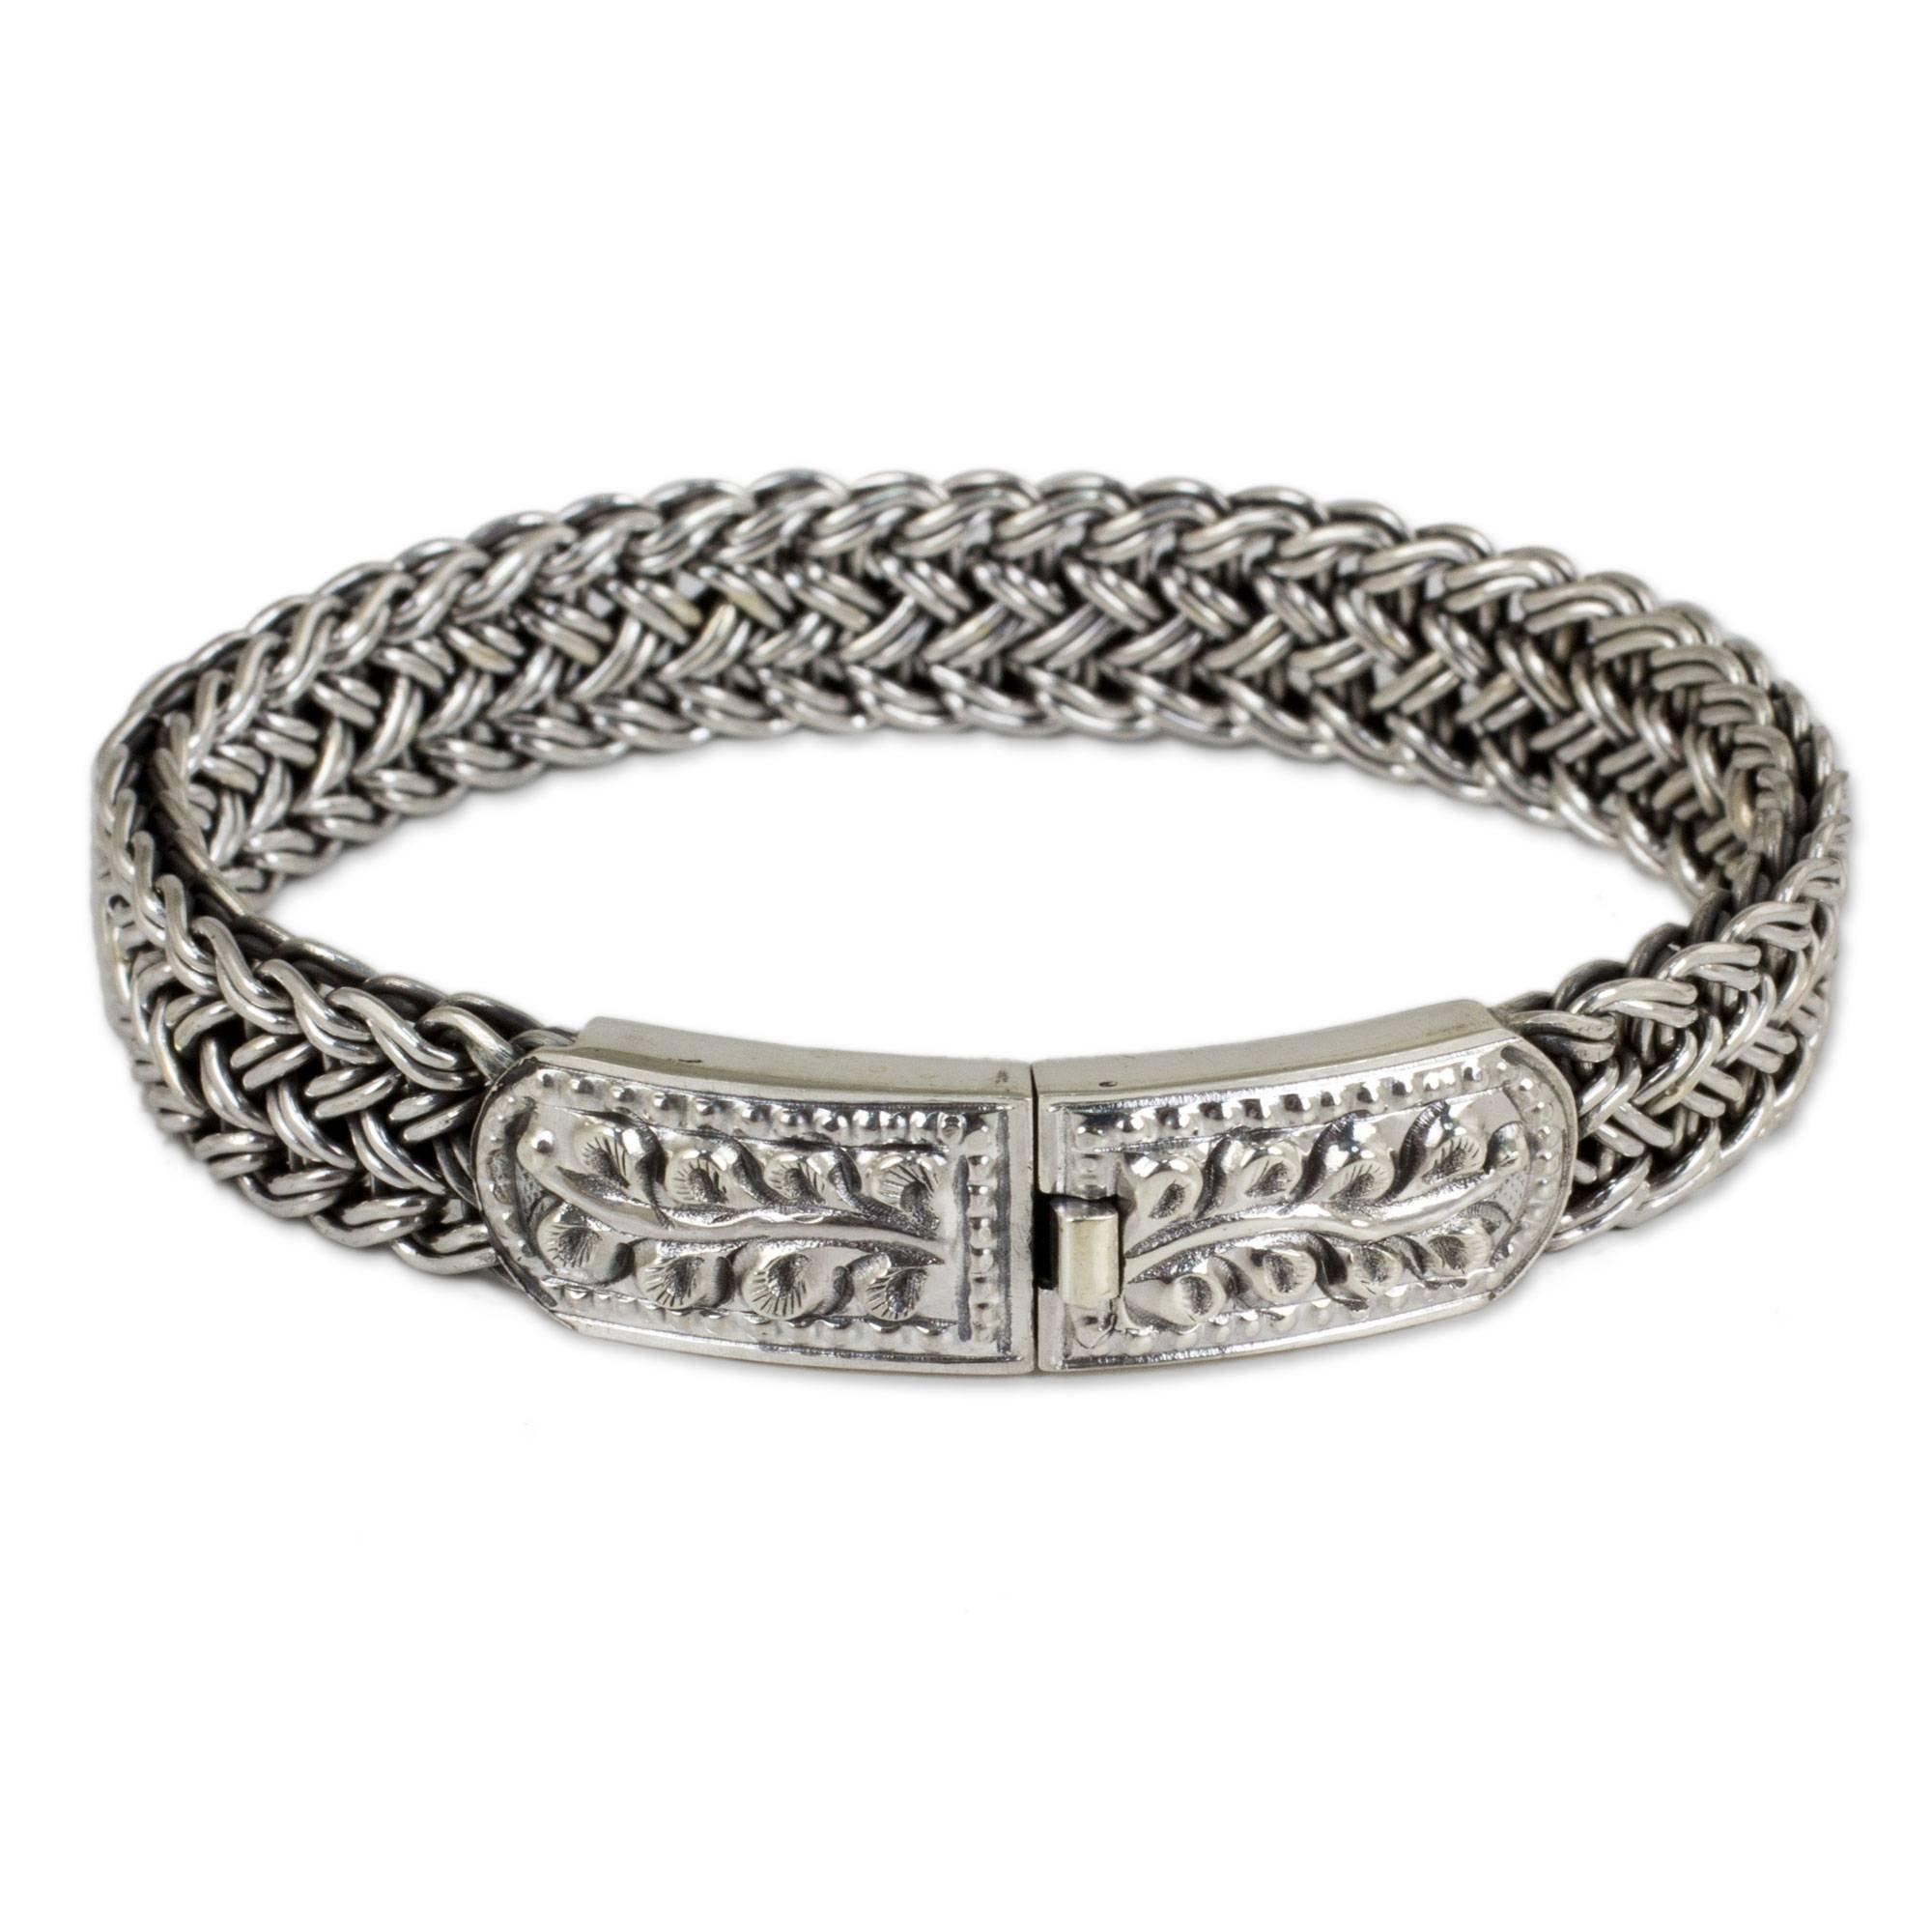 NOVICA .925 Sterling Silver Braided Chain Wristband Bracelet, 7'', Unity'